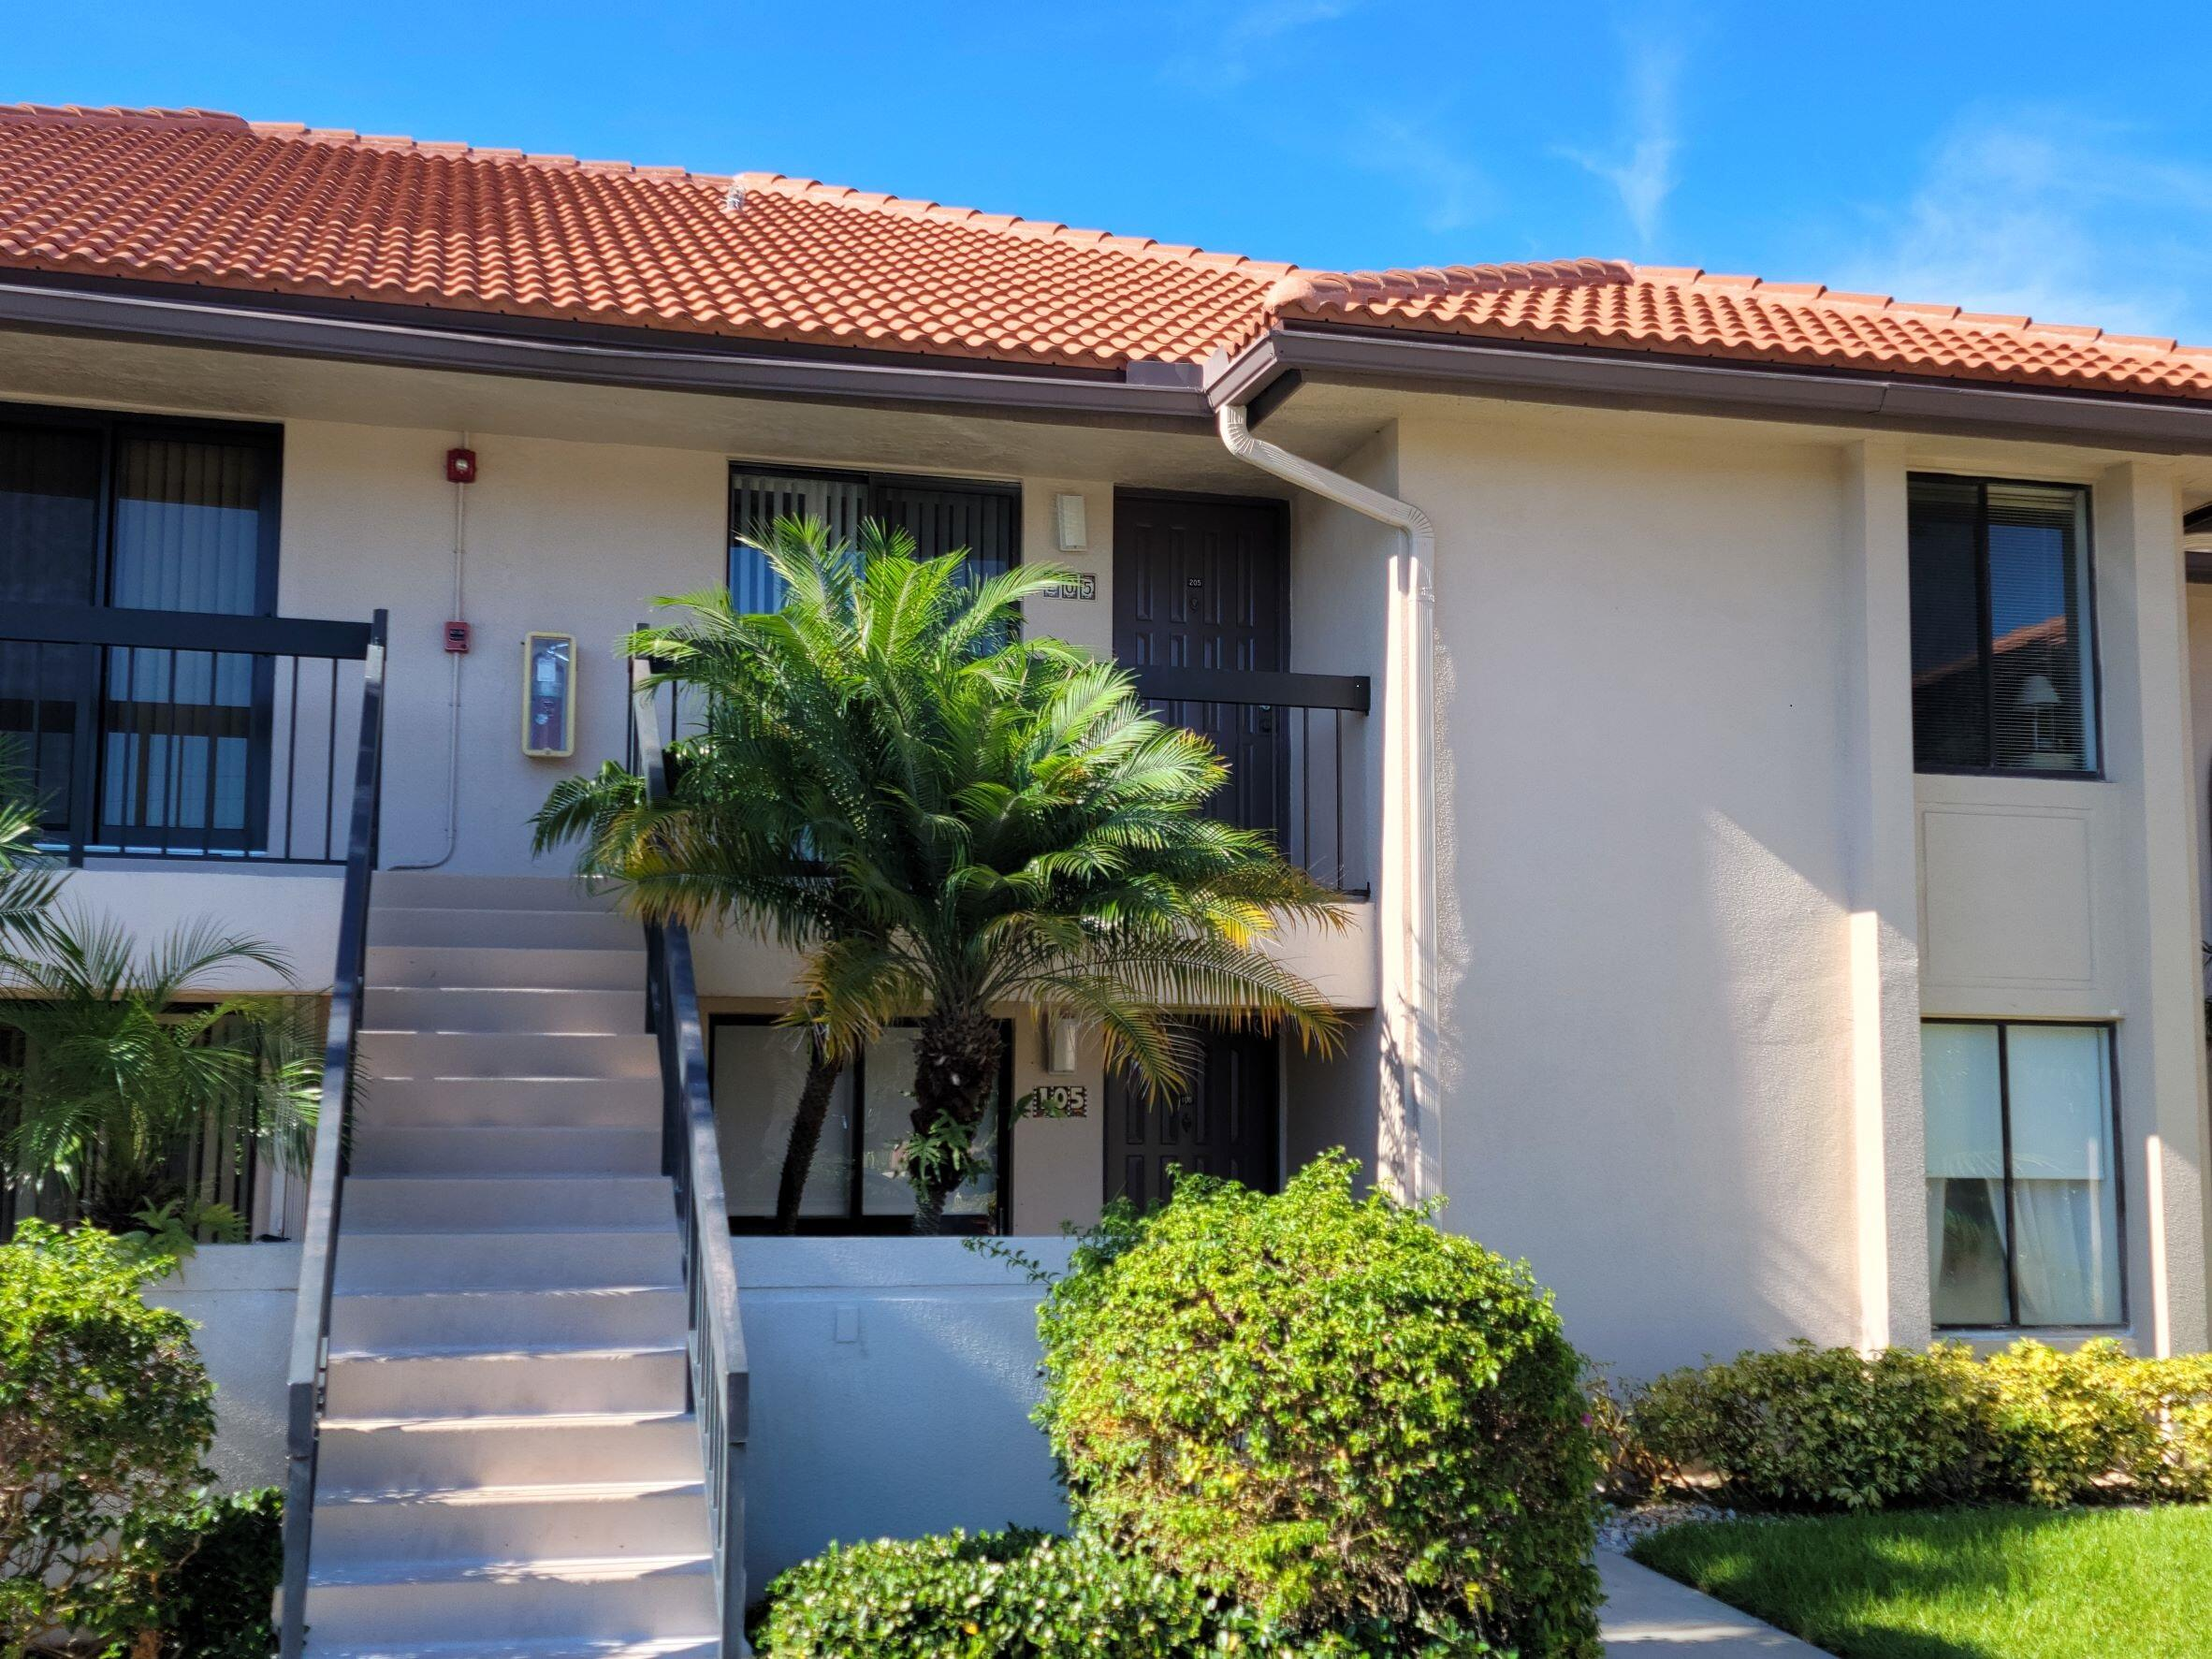 301 Club Circle 205, Boca Raton, FL 33487